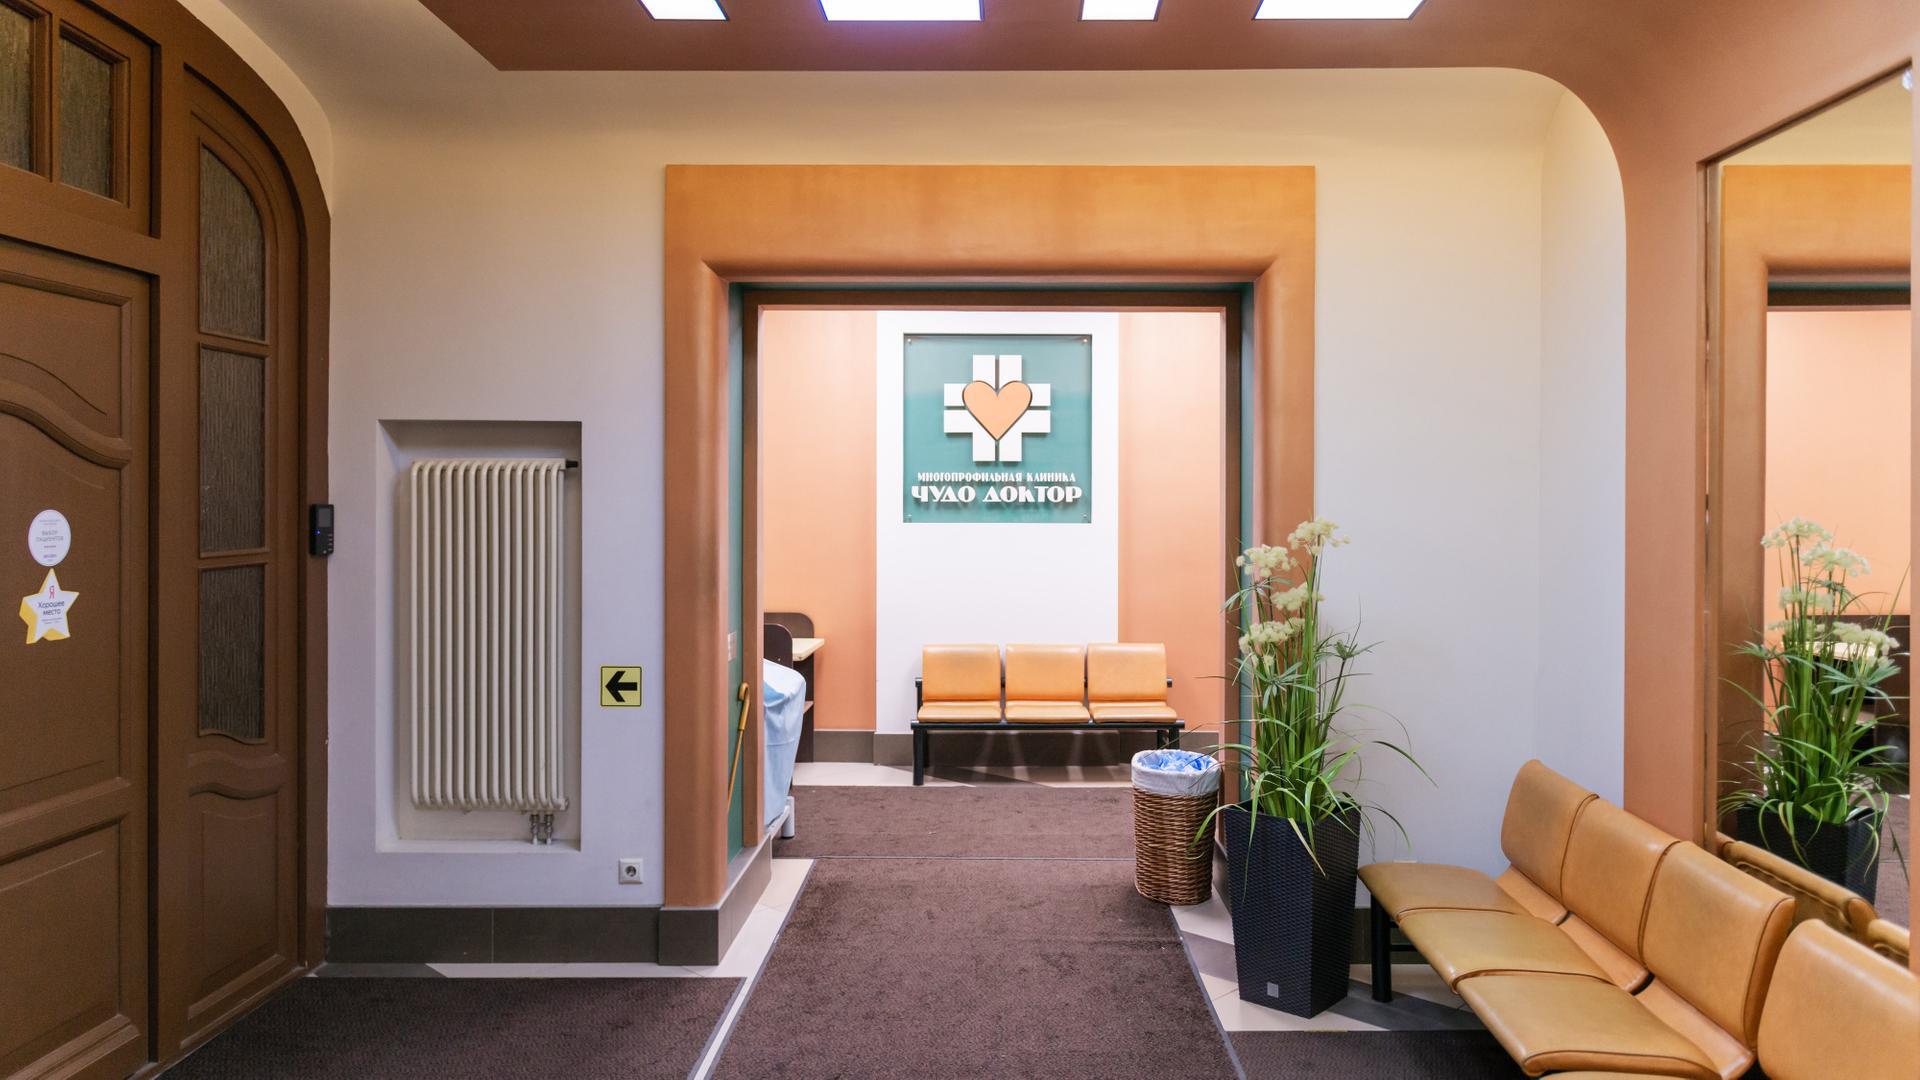 Медицинский центр Чудо Доктор